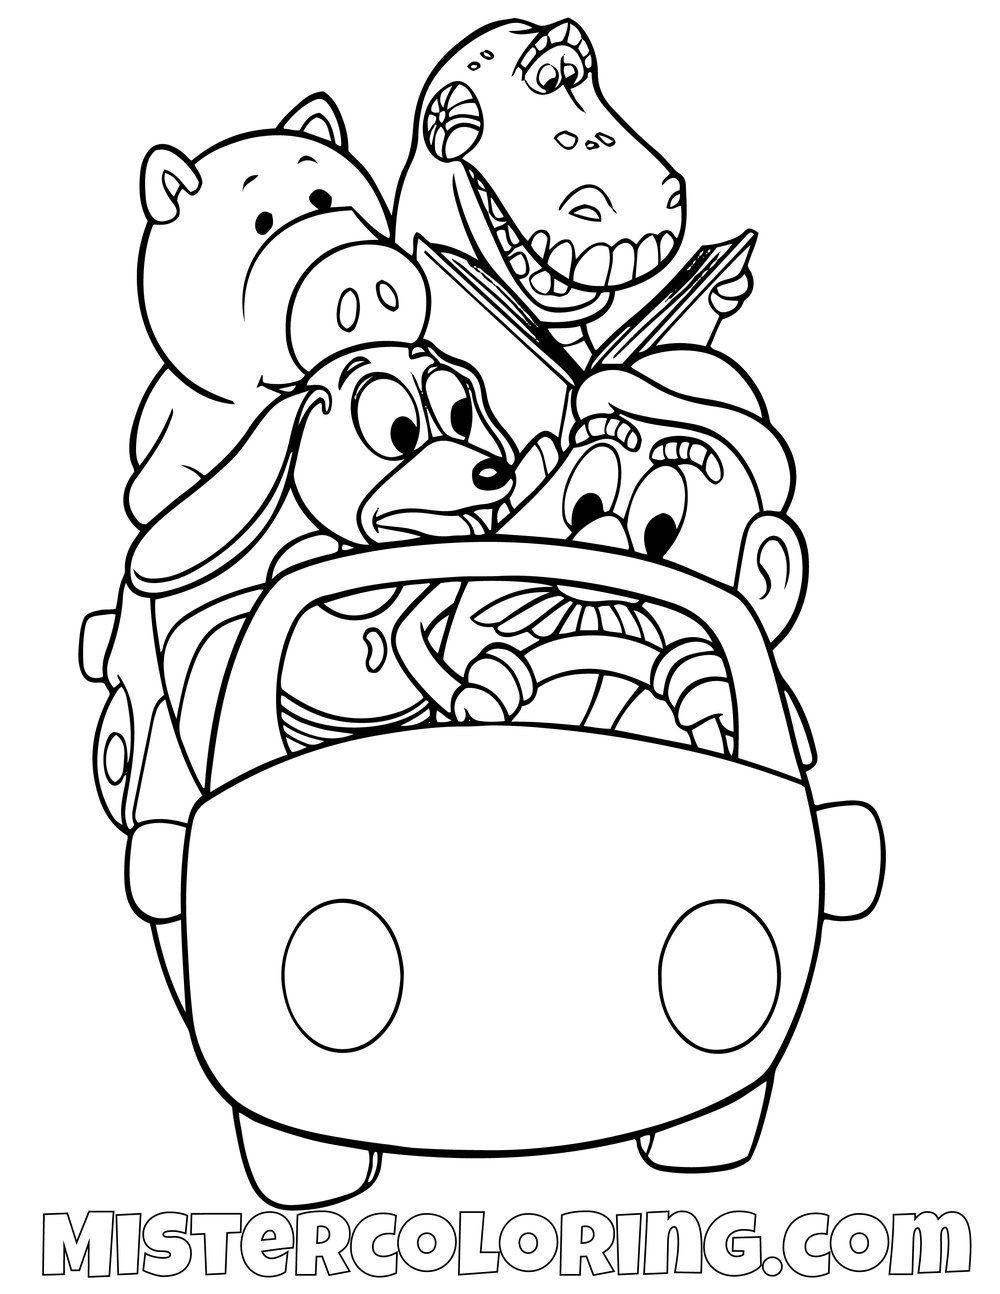 Ham Rex Slinky Dog And Mr Potato Head Driving A Car Toy Story